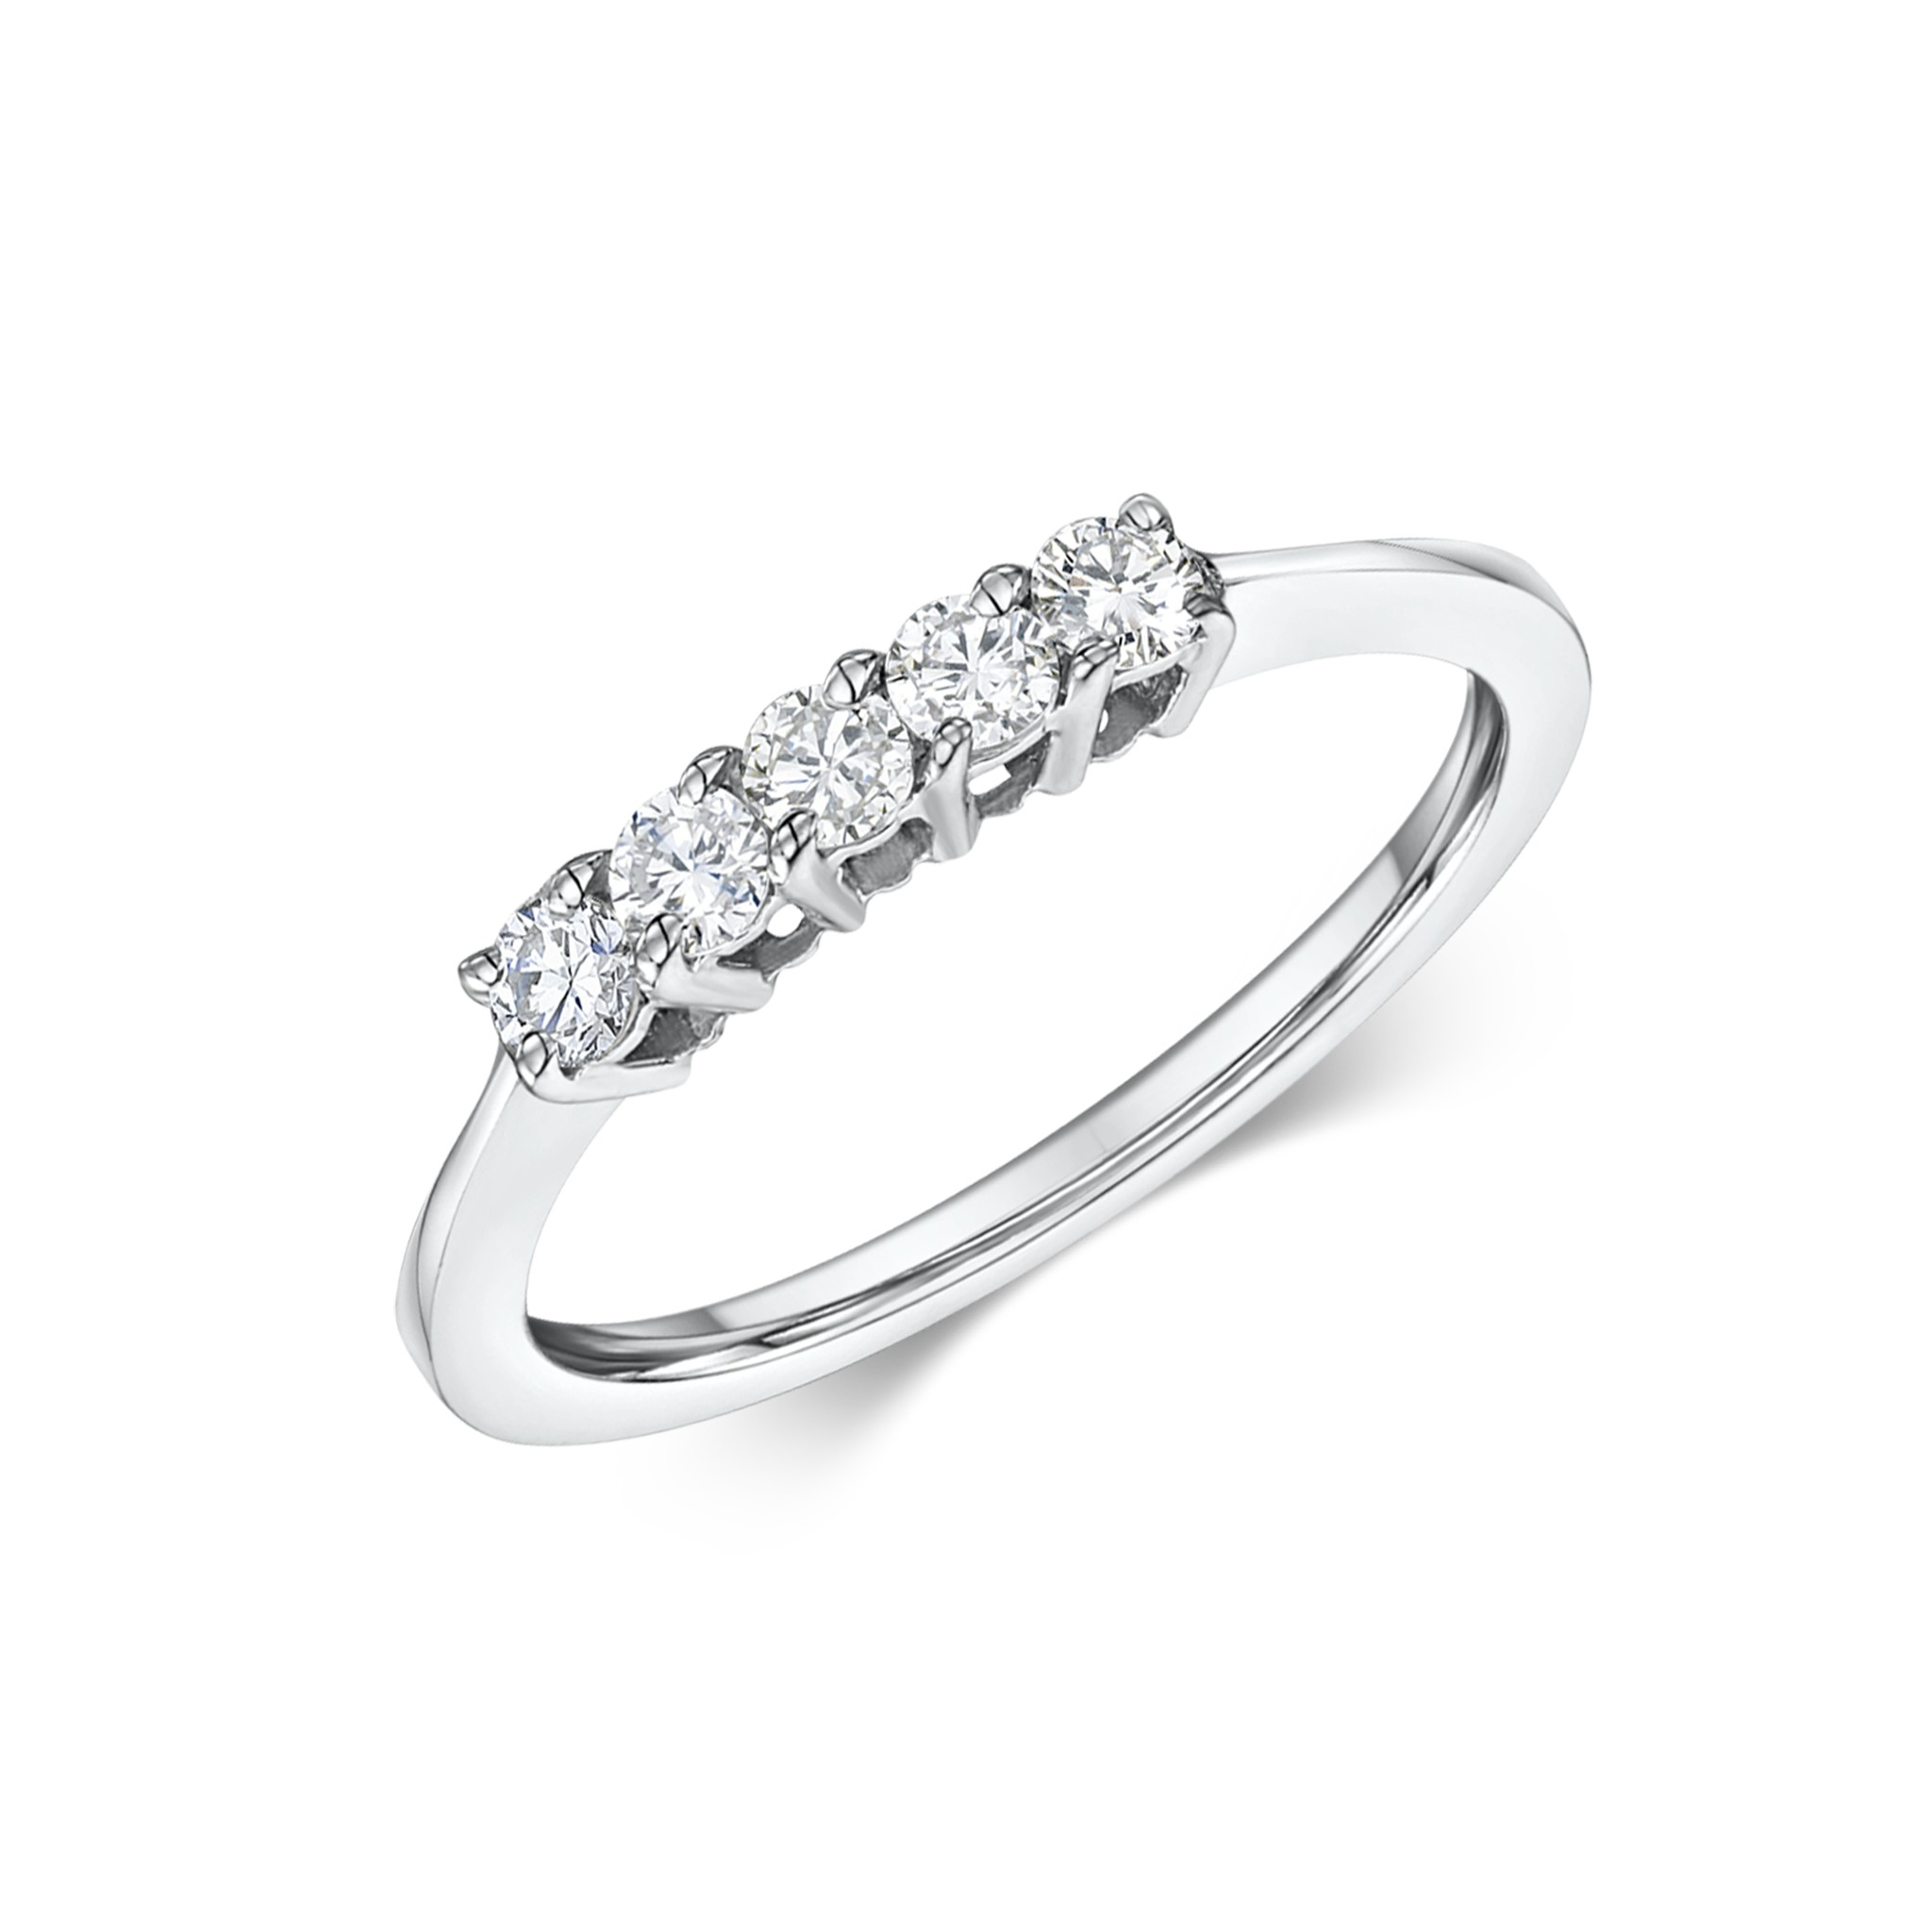 60bb20378b μισόβερο σειρέ δαχτυλίδι με μπριγιάν